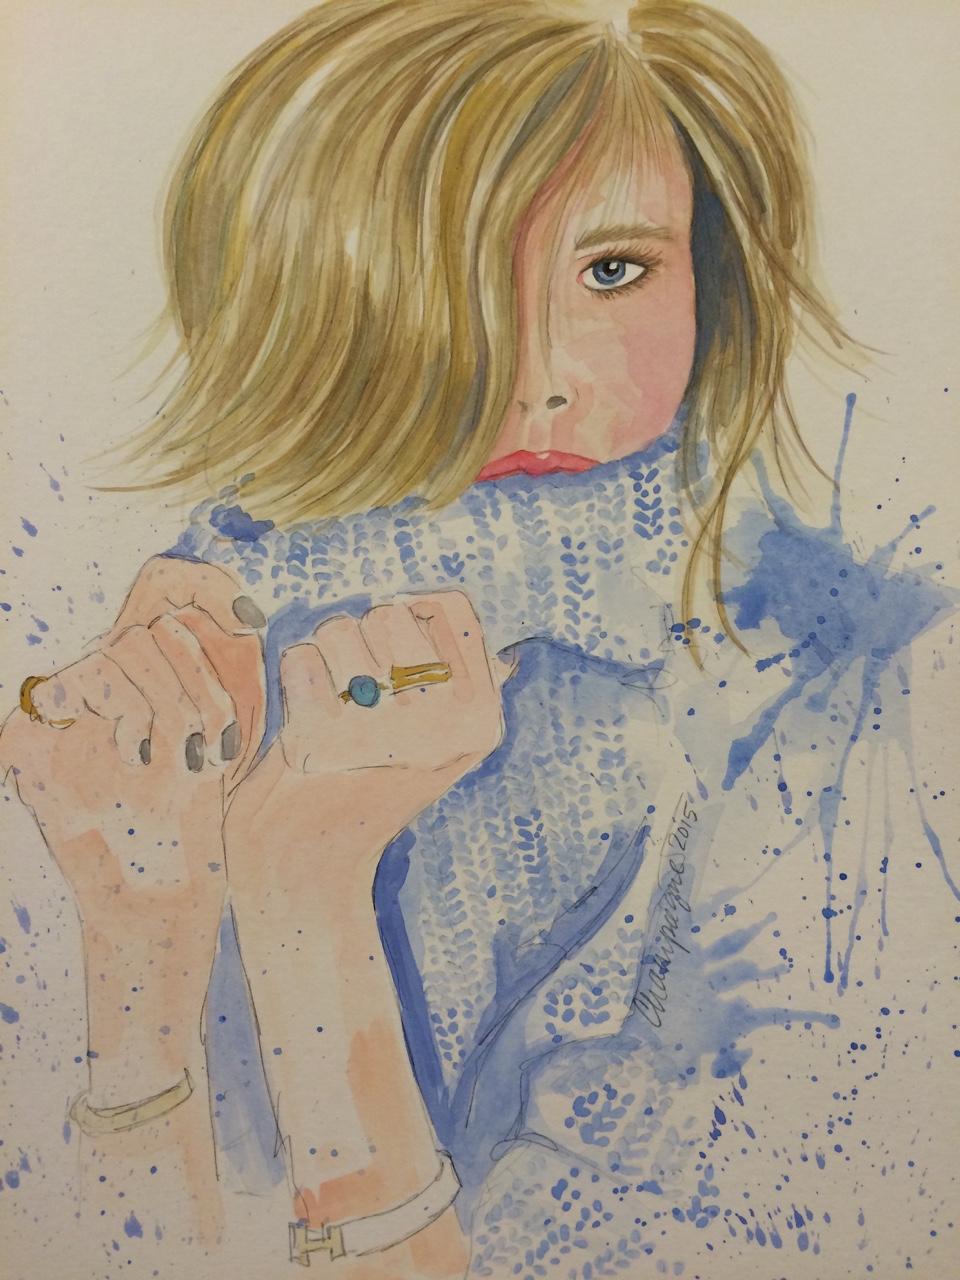 Tumblr girls no 3 watercolor on paper original nfs prints